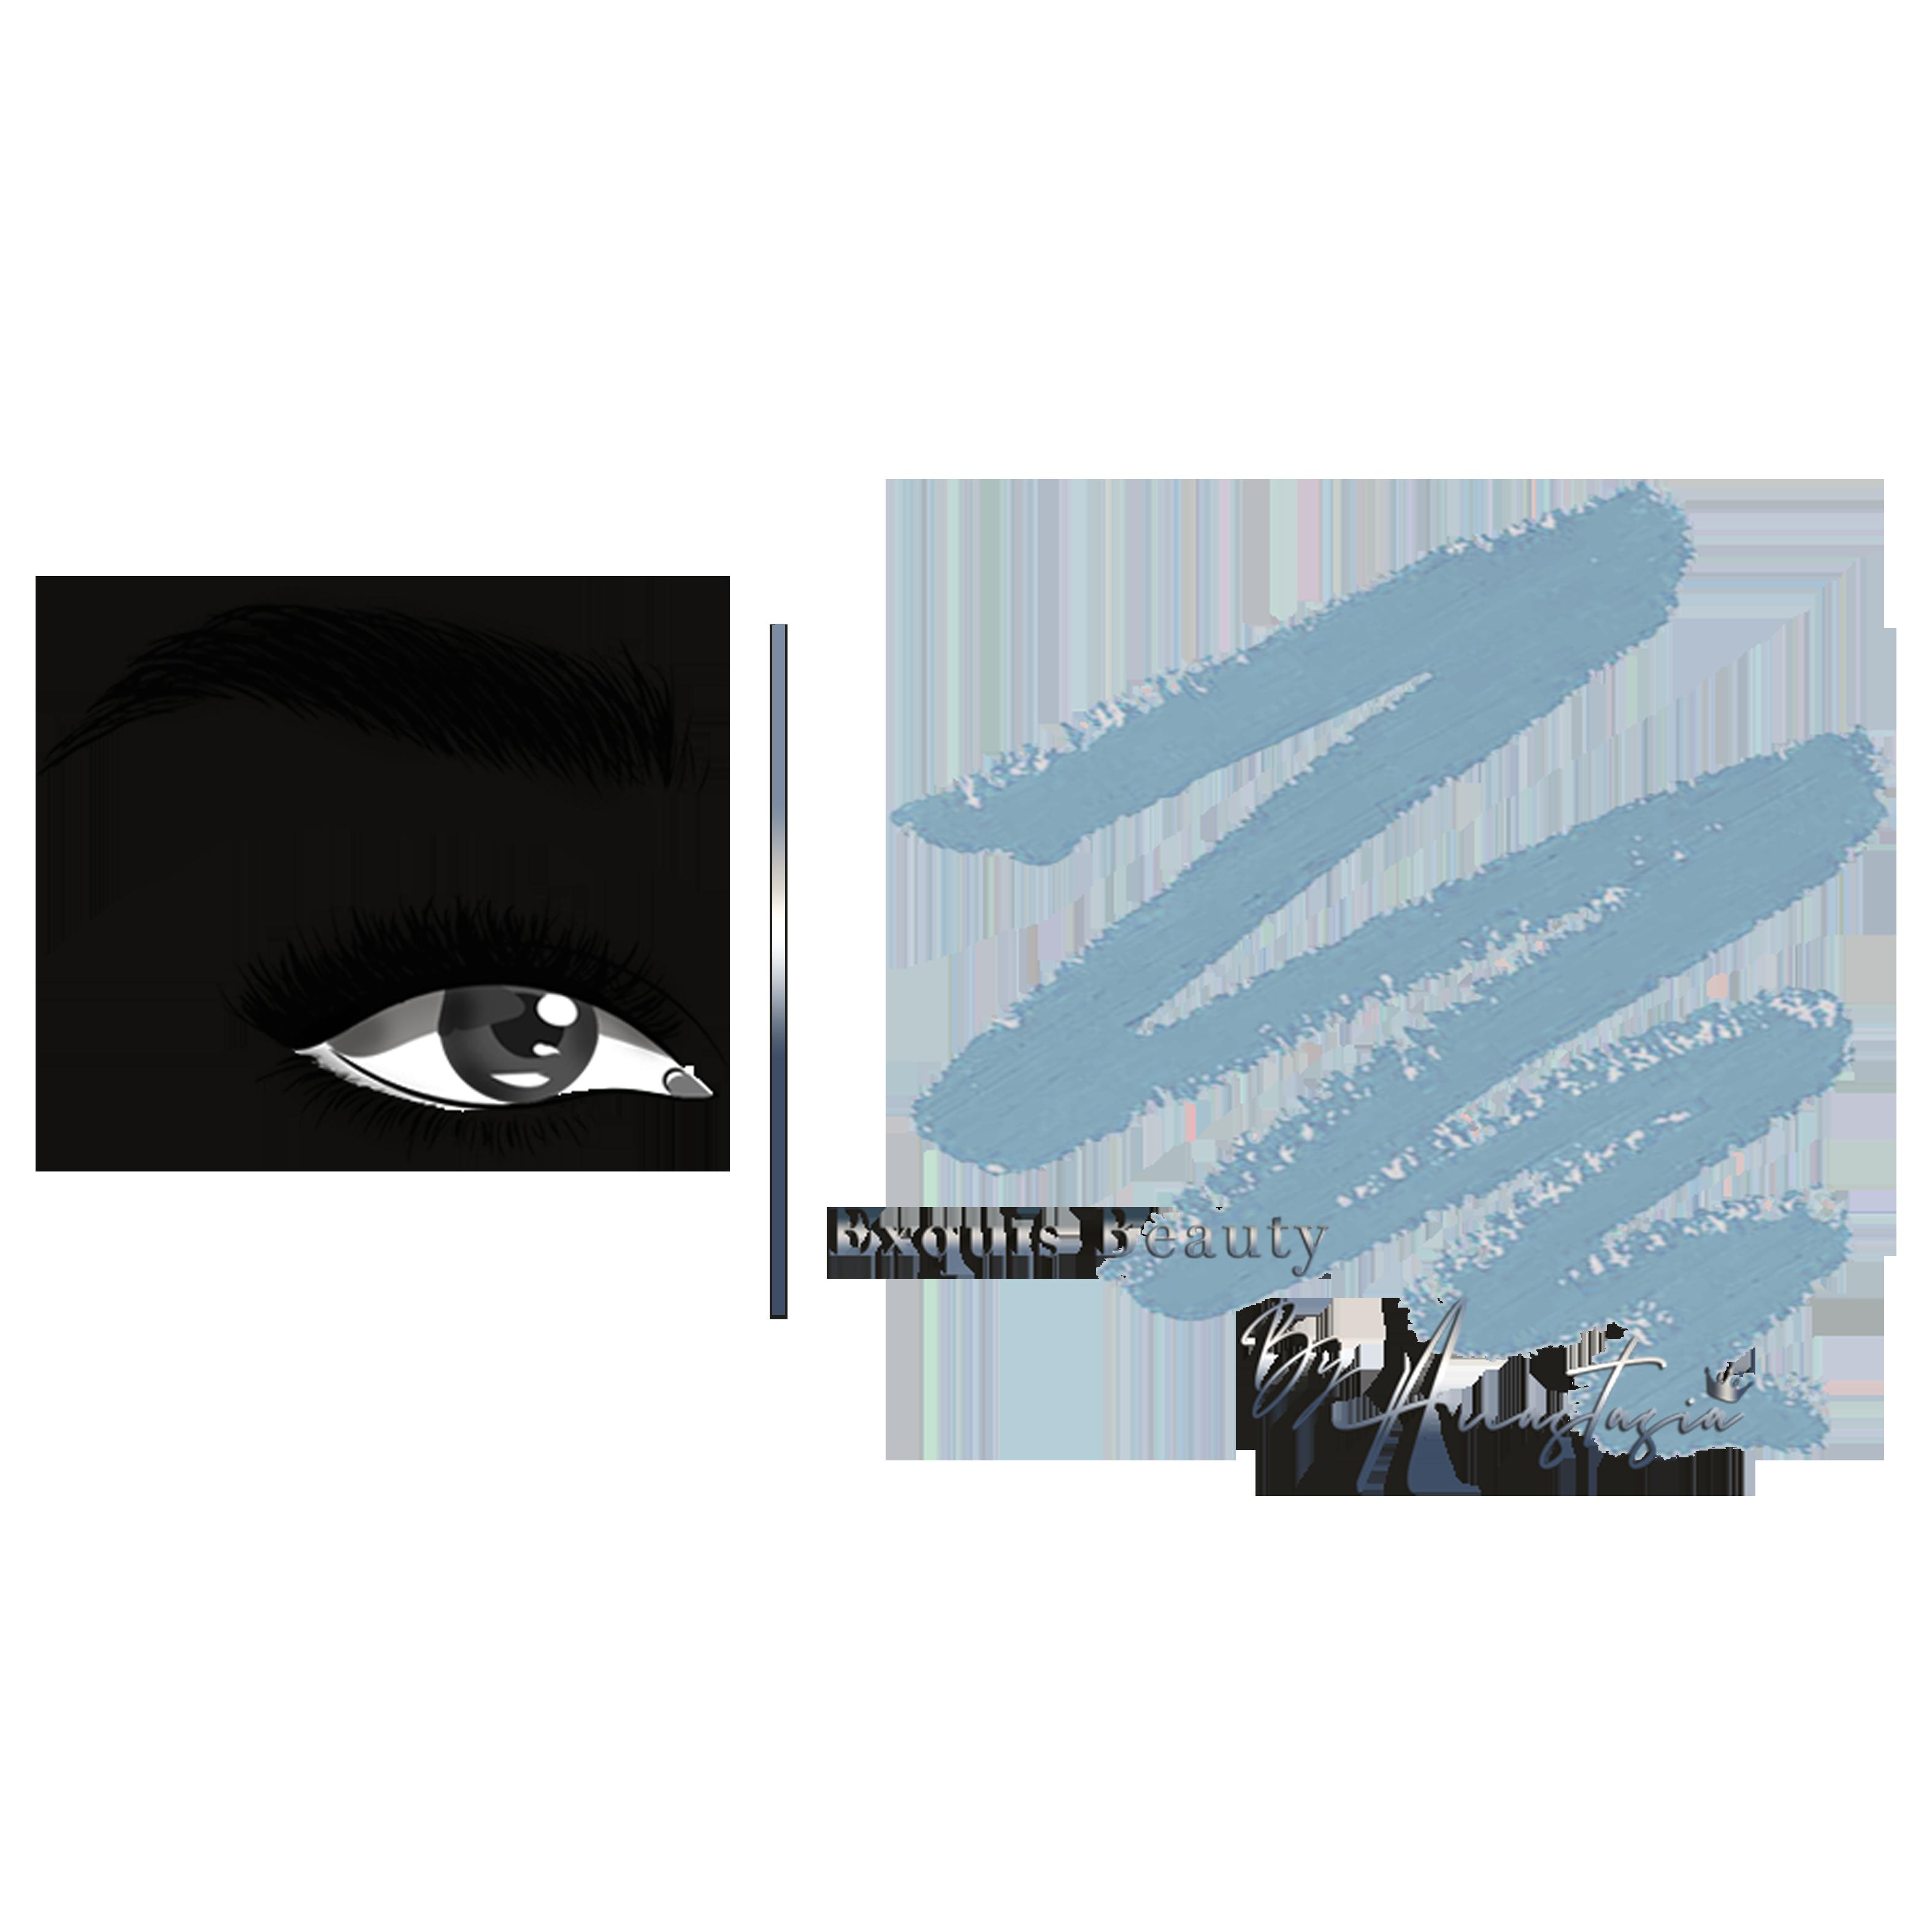 exquisbeautybyanastasia website design by sbkomarketing.